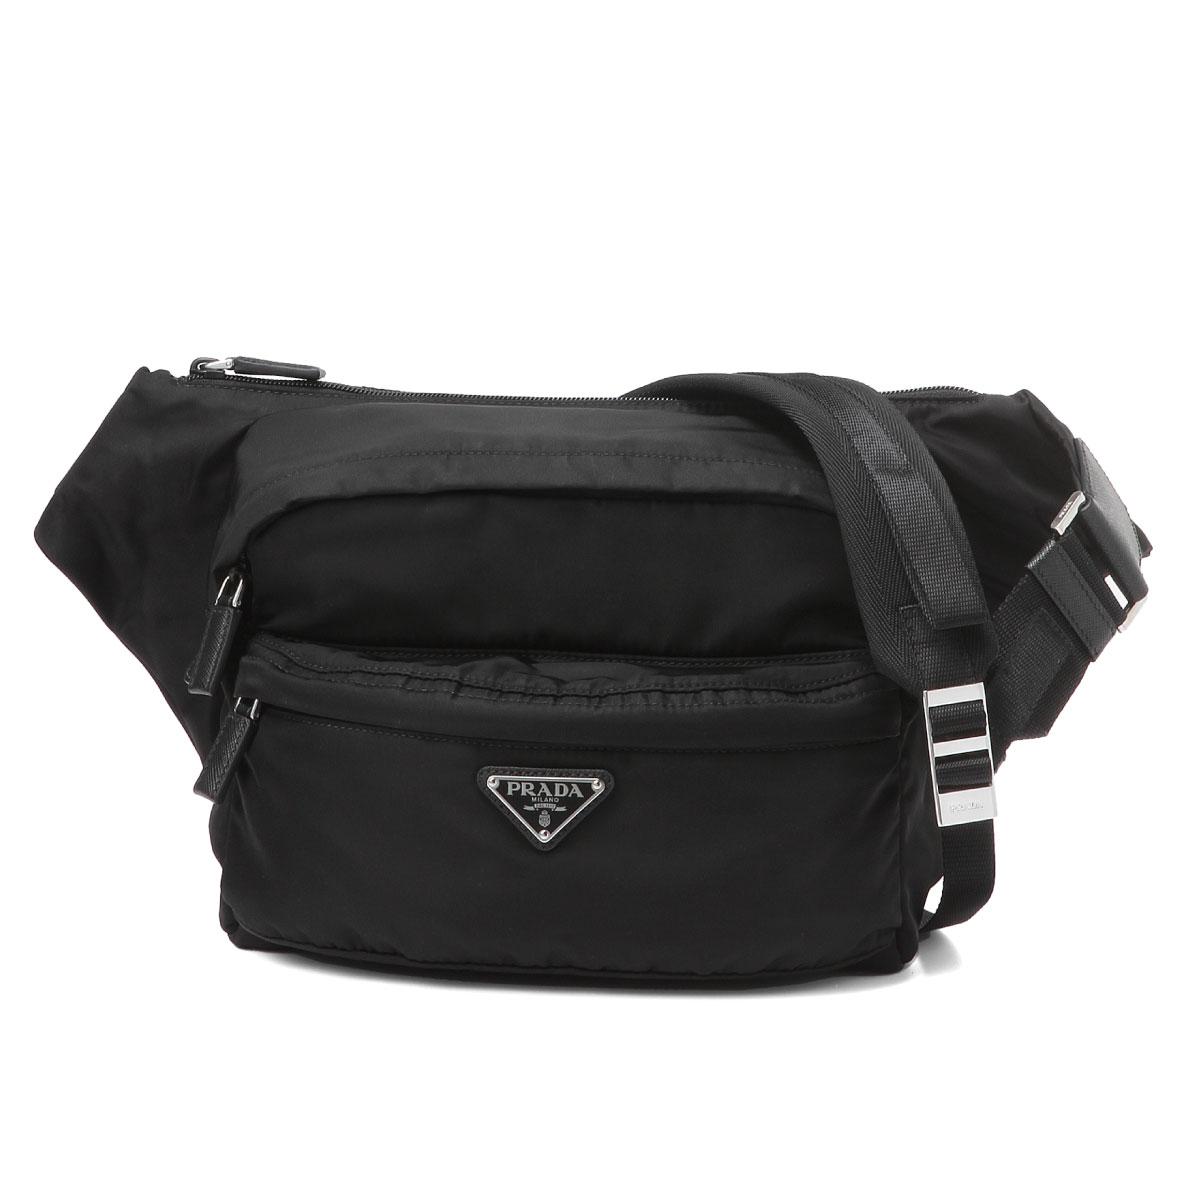 01ef19b1a2973f importshopdouble: Prada PRADA bag men 2VH038 973 F0002 bum-bag NERO ...